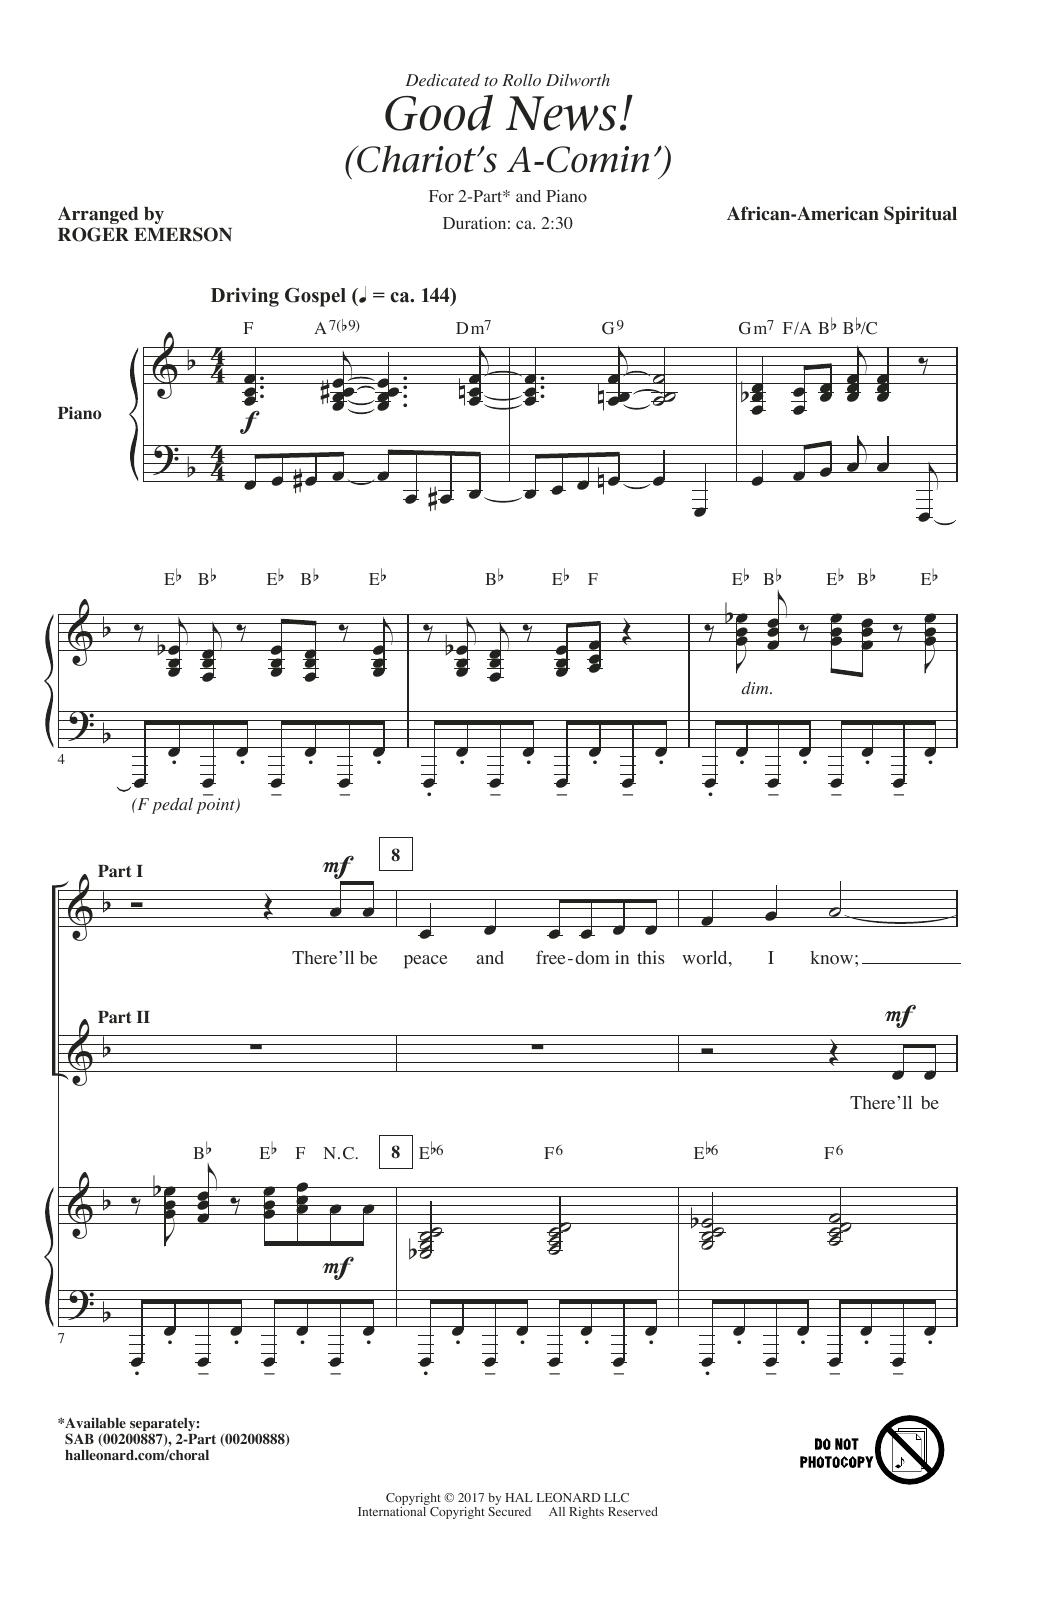 Partition chorale Good News, The Chariot's Comin' de Roger Emerson - 2 voix